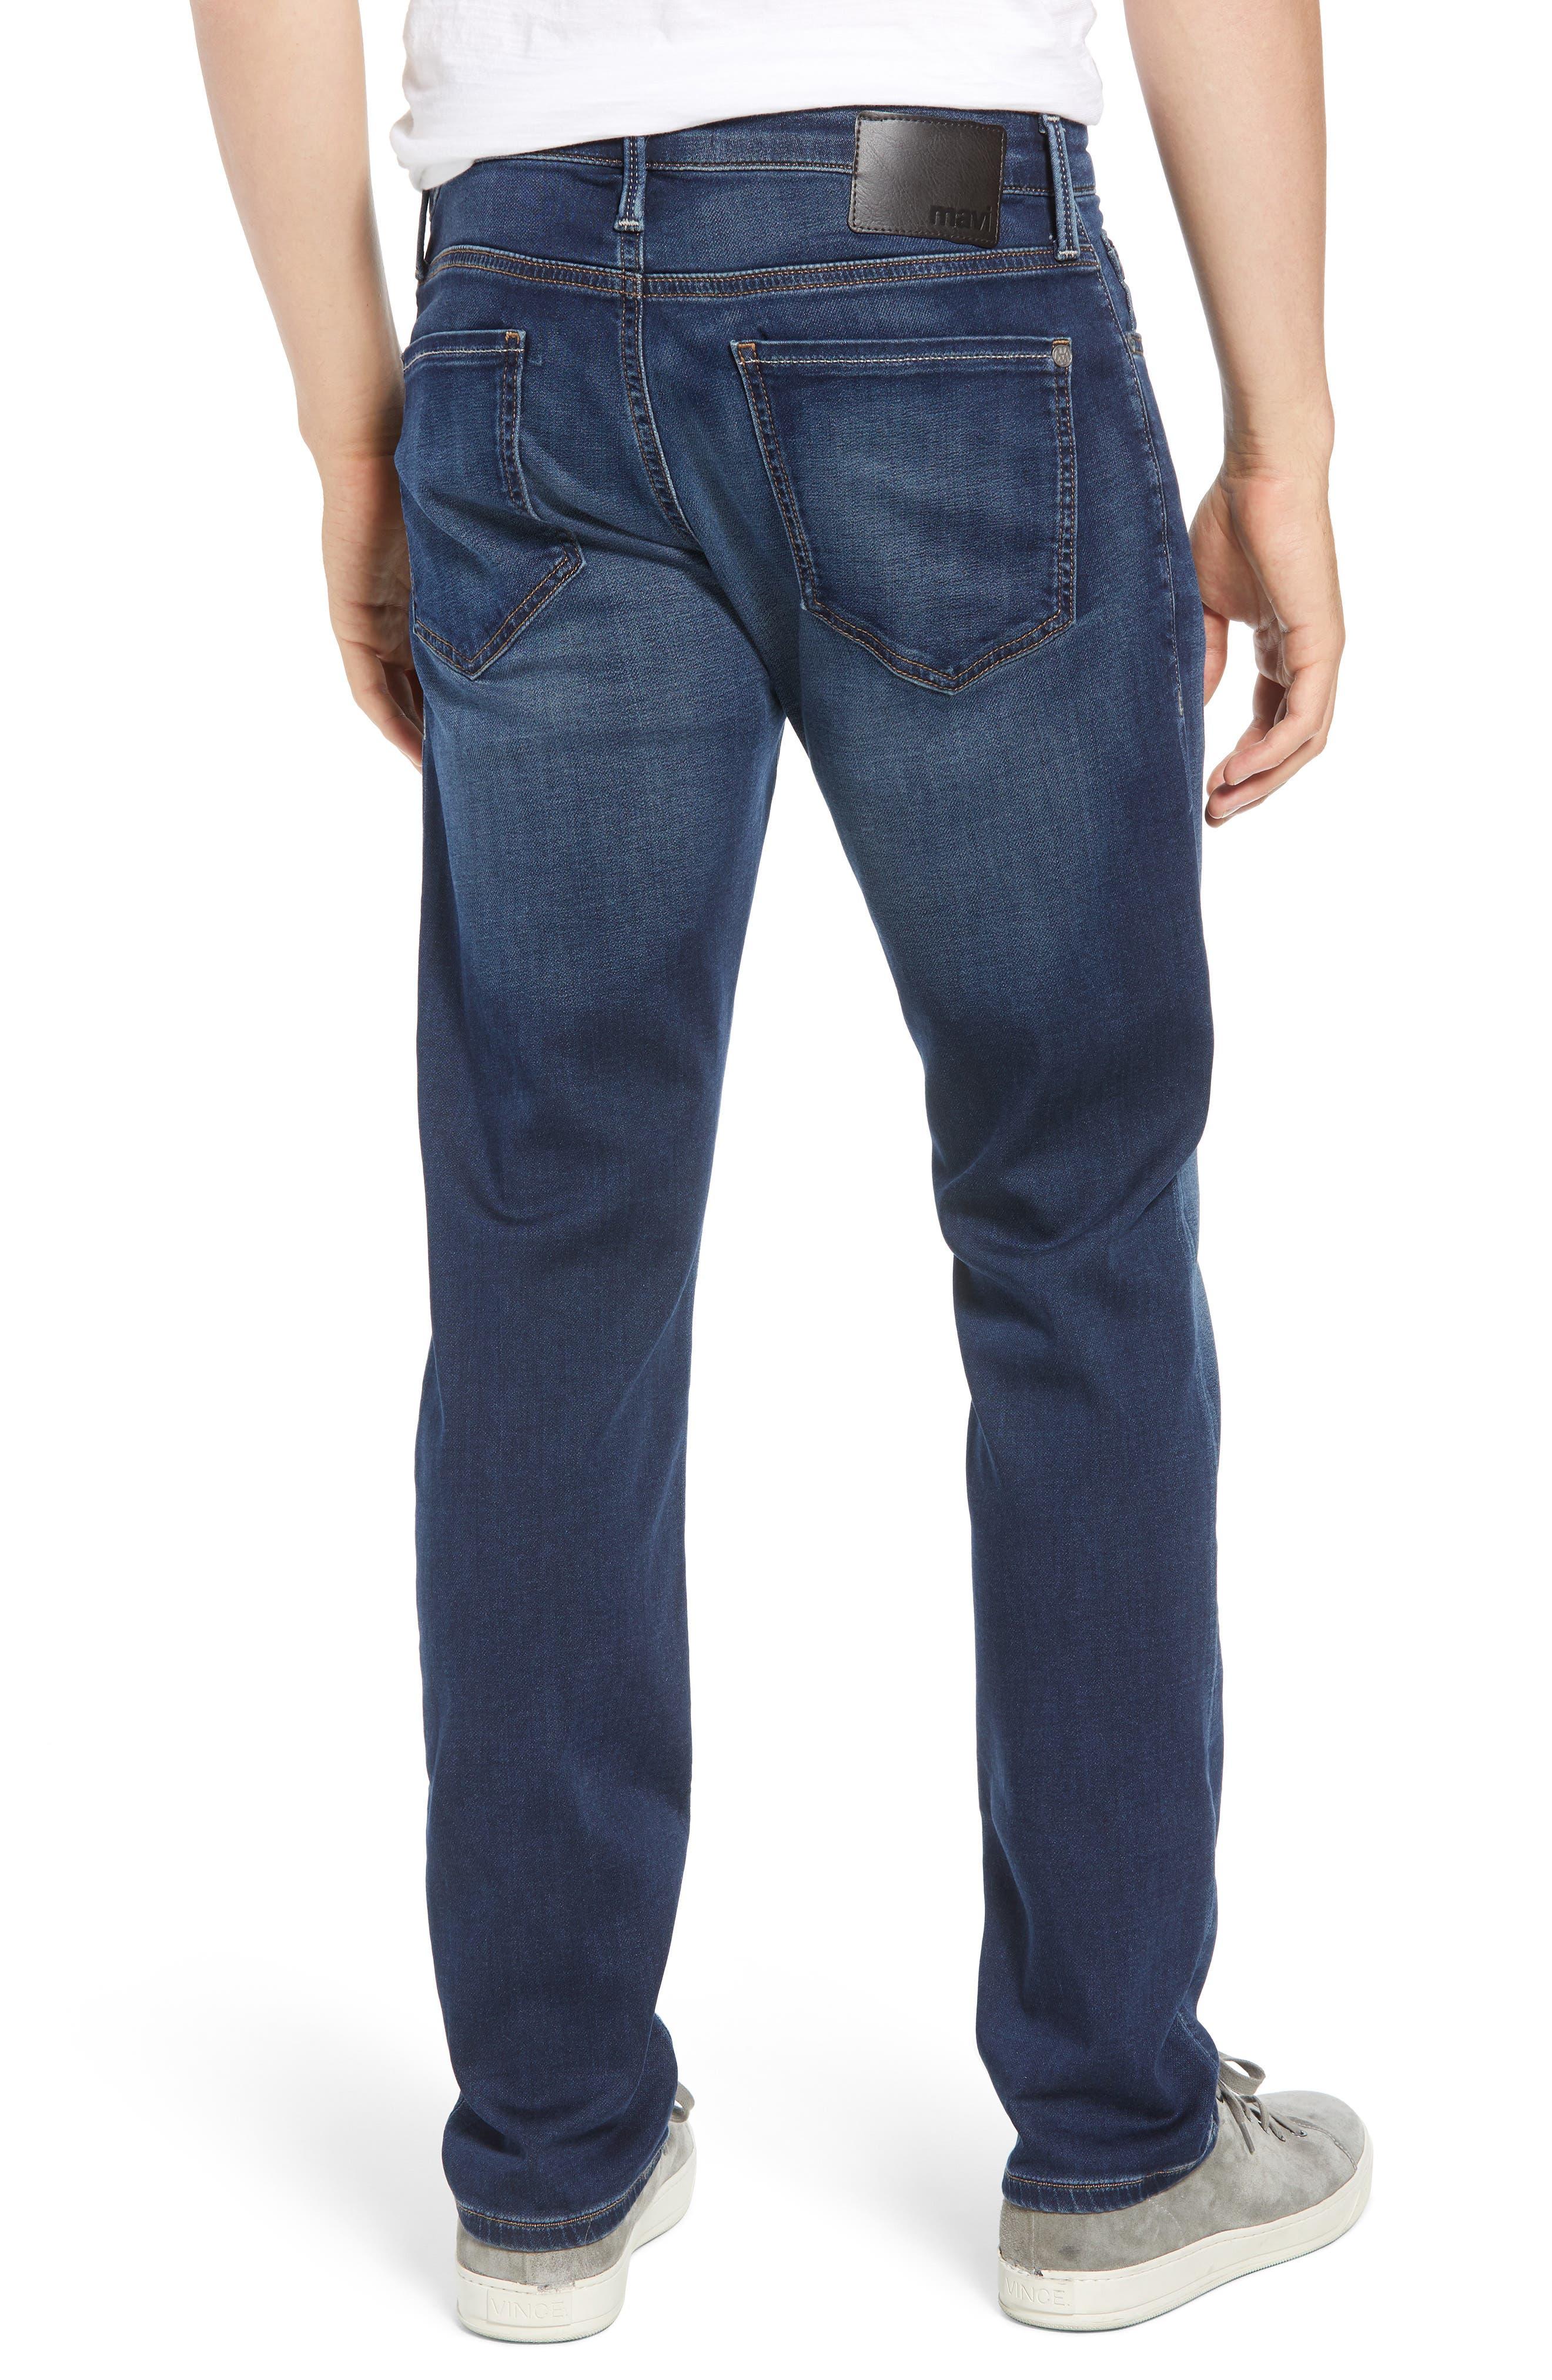 Jake Slim Fit Jeans,                             Alternate thumbnail 2, color,                             DARK SPORTY